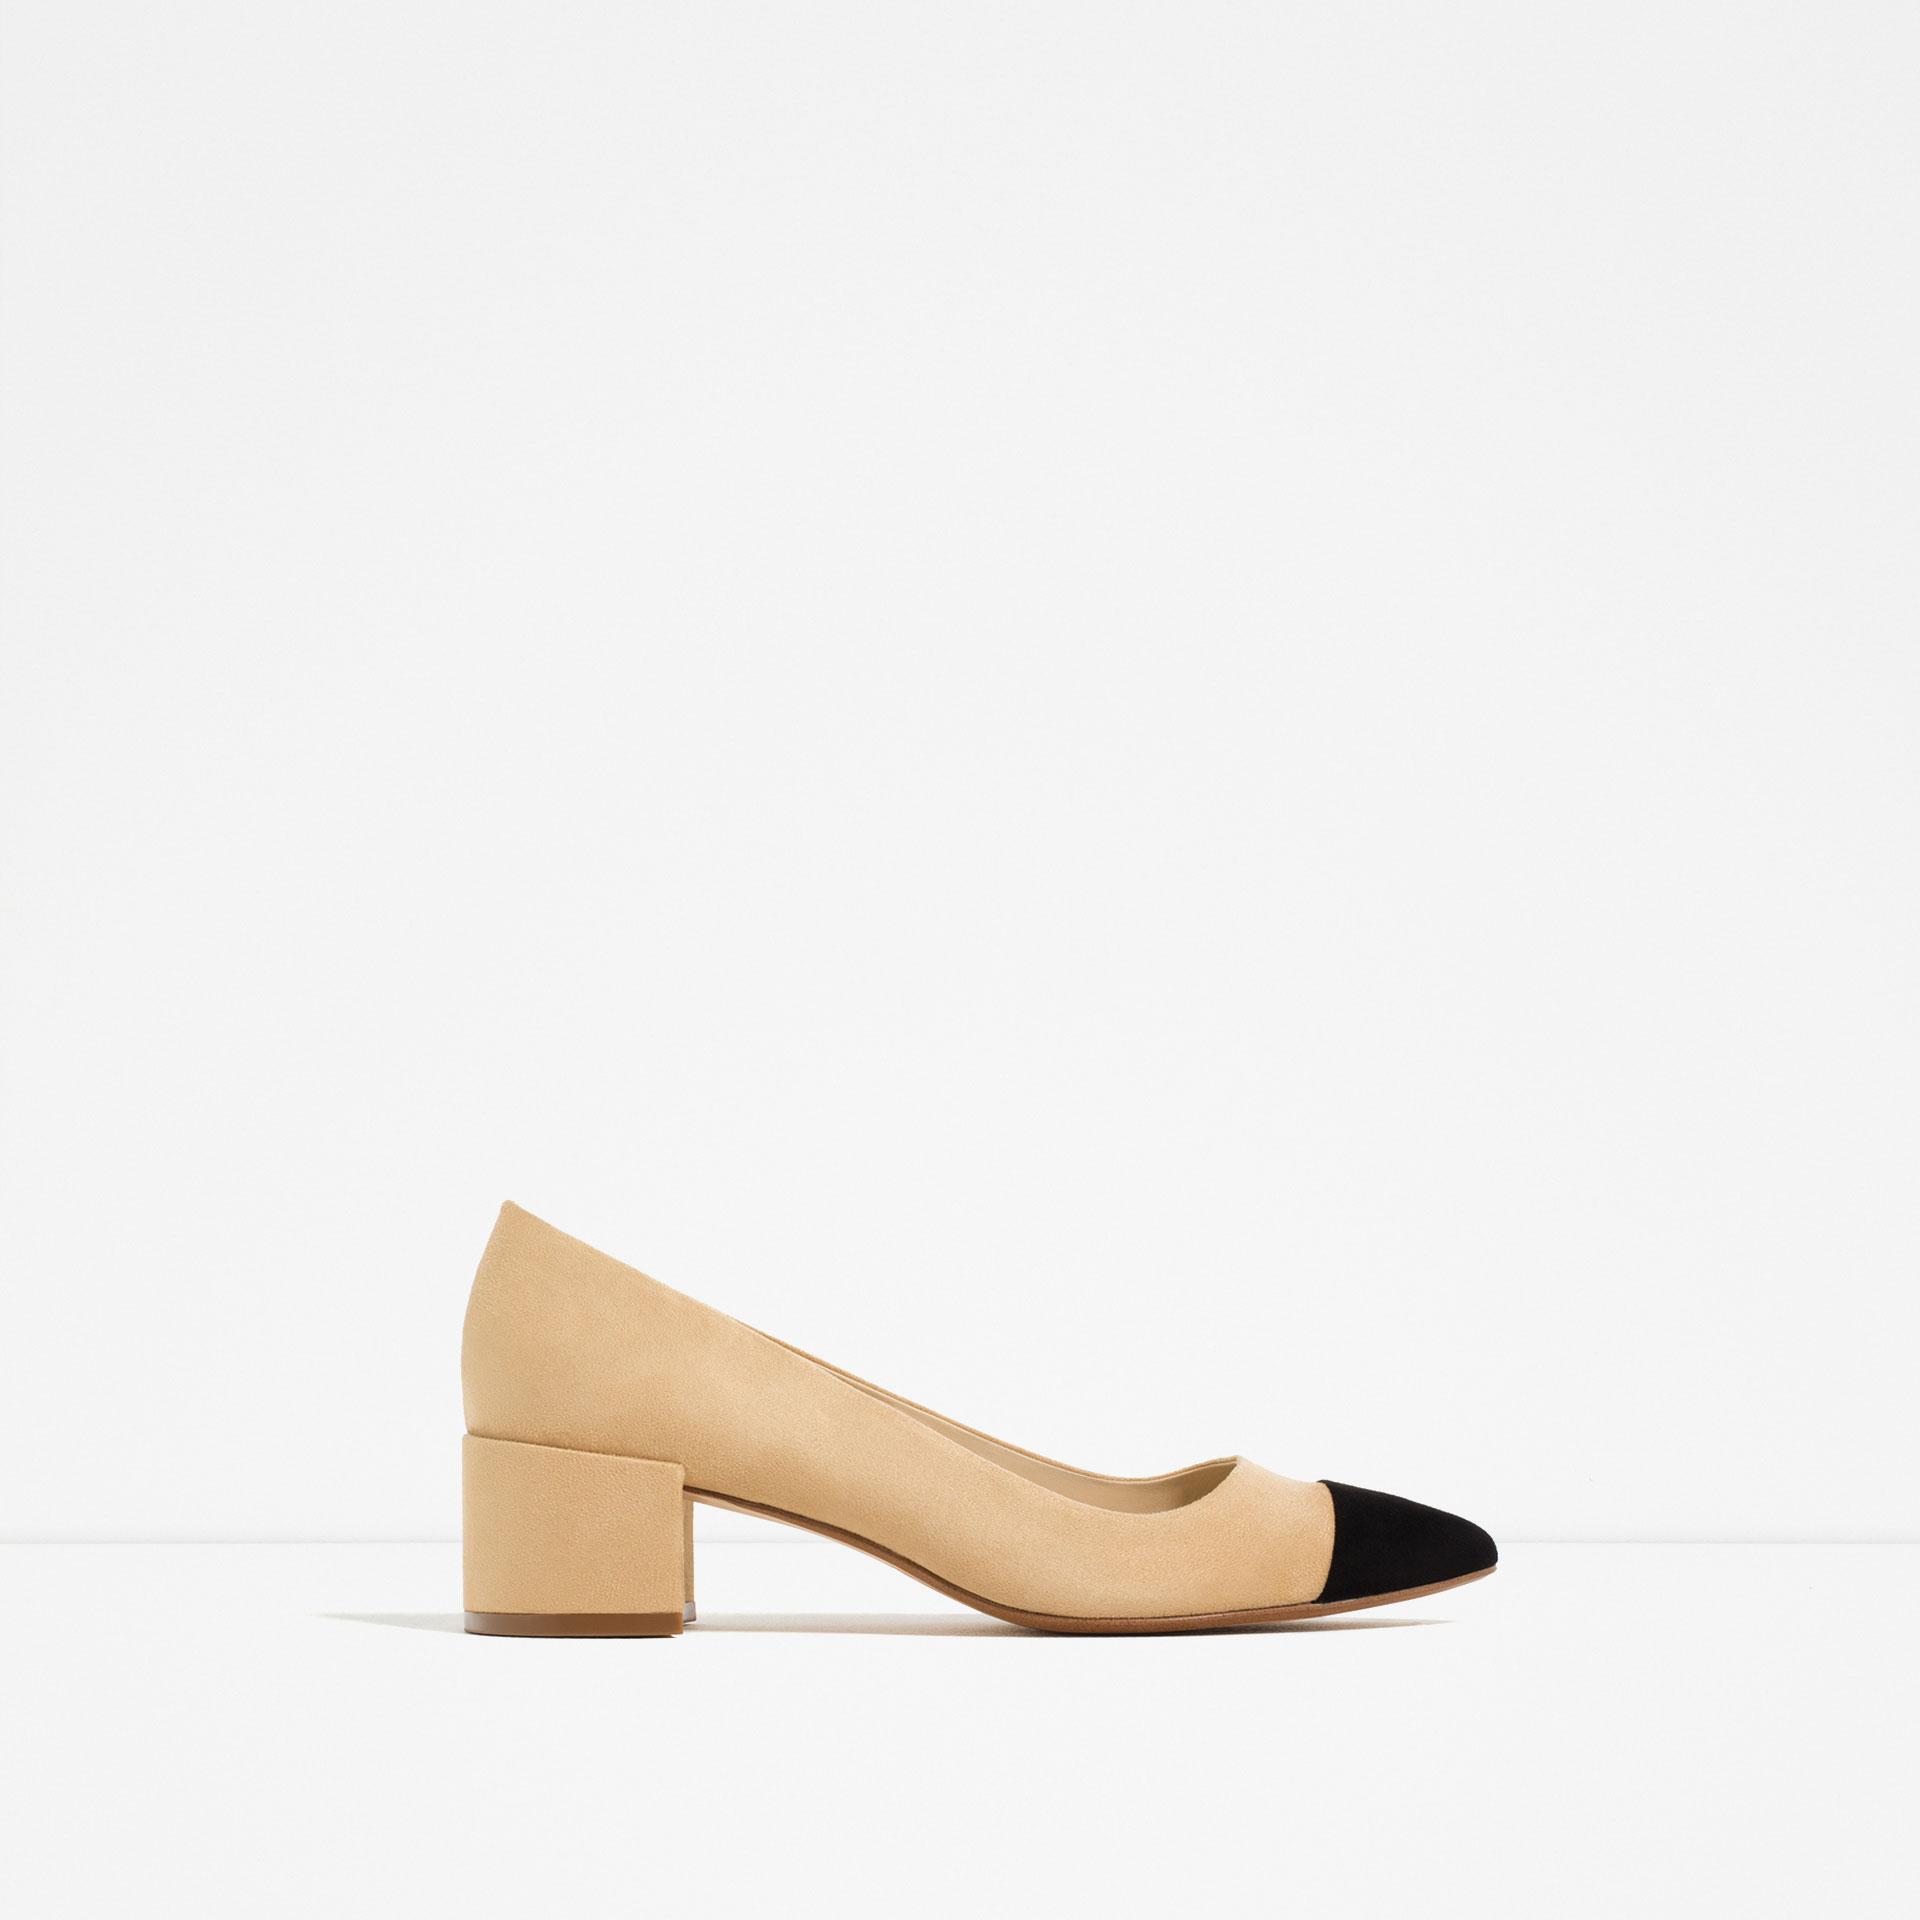 zapato-inspiracion-chanel-zara